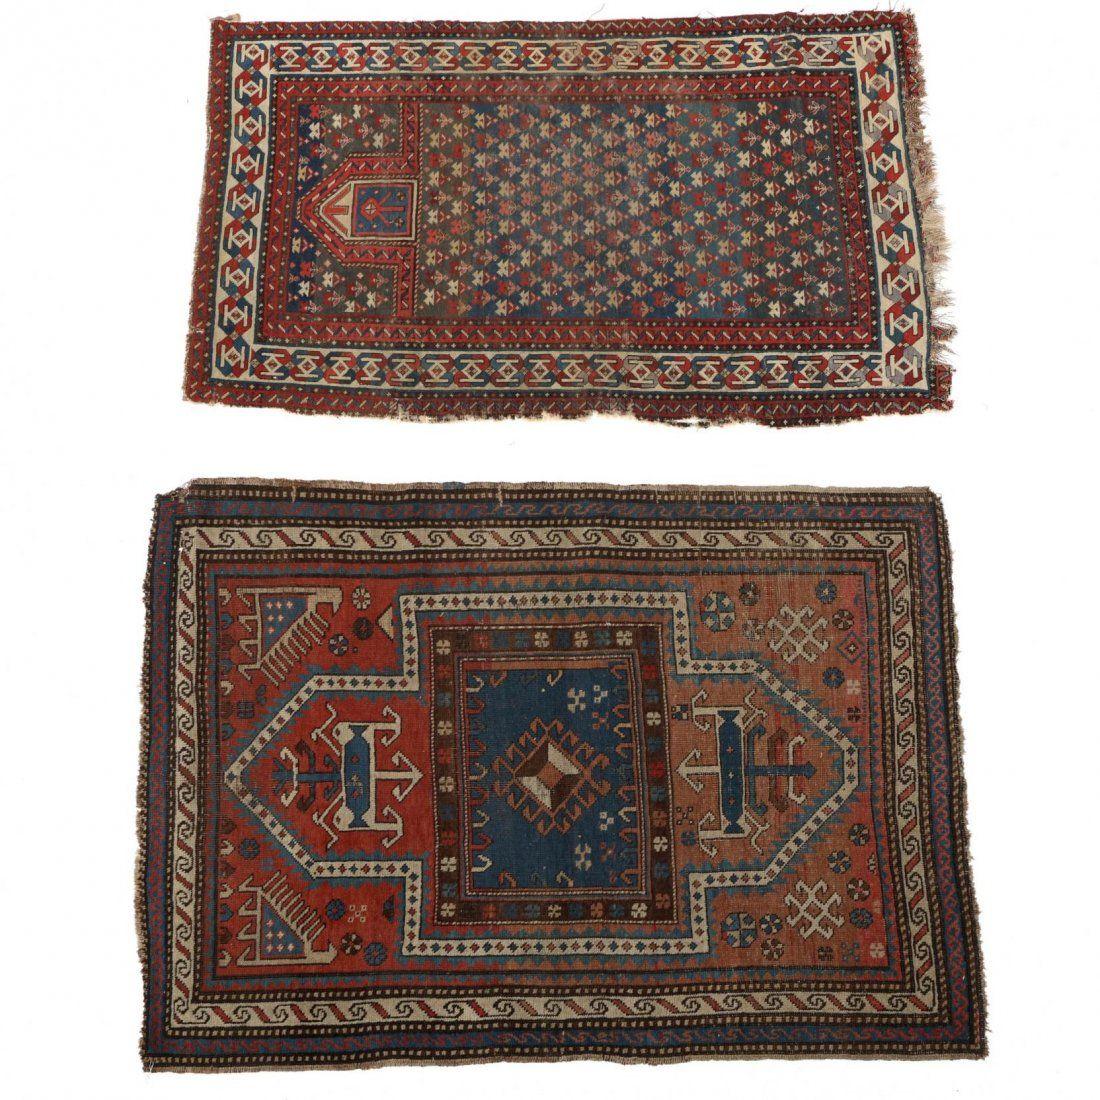 Two Semi Antique Persian Area Rugs